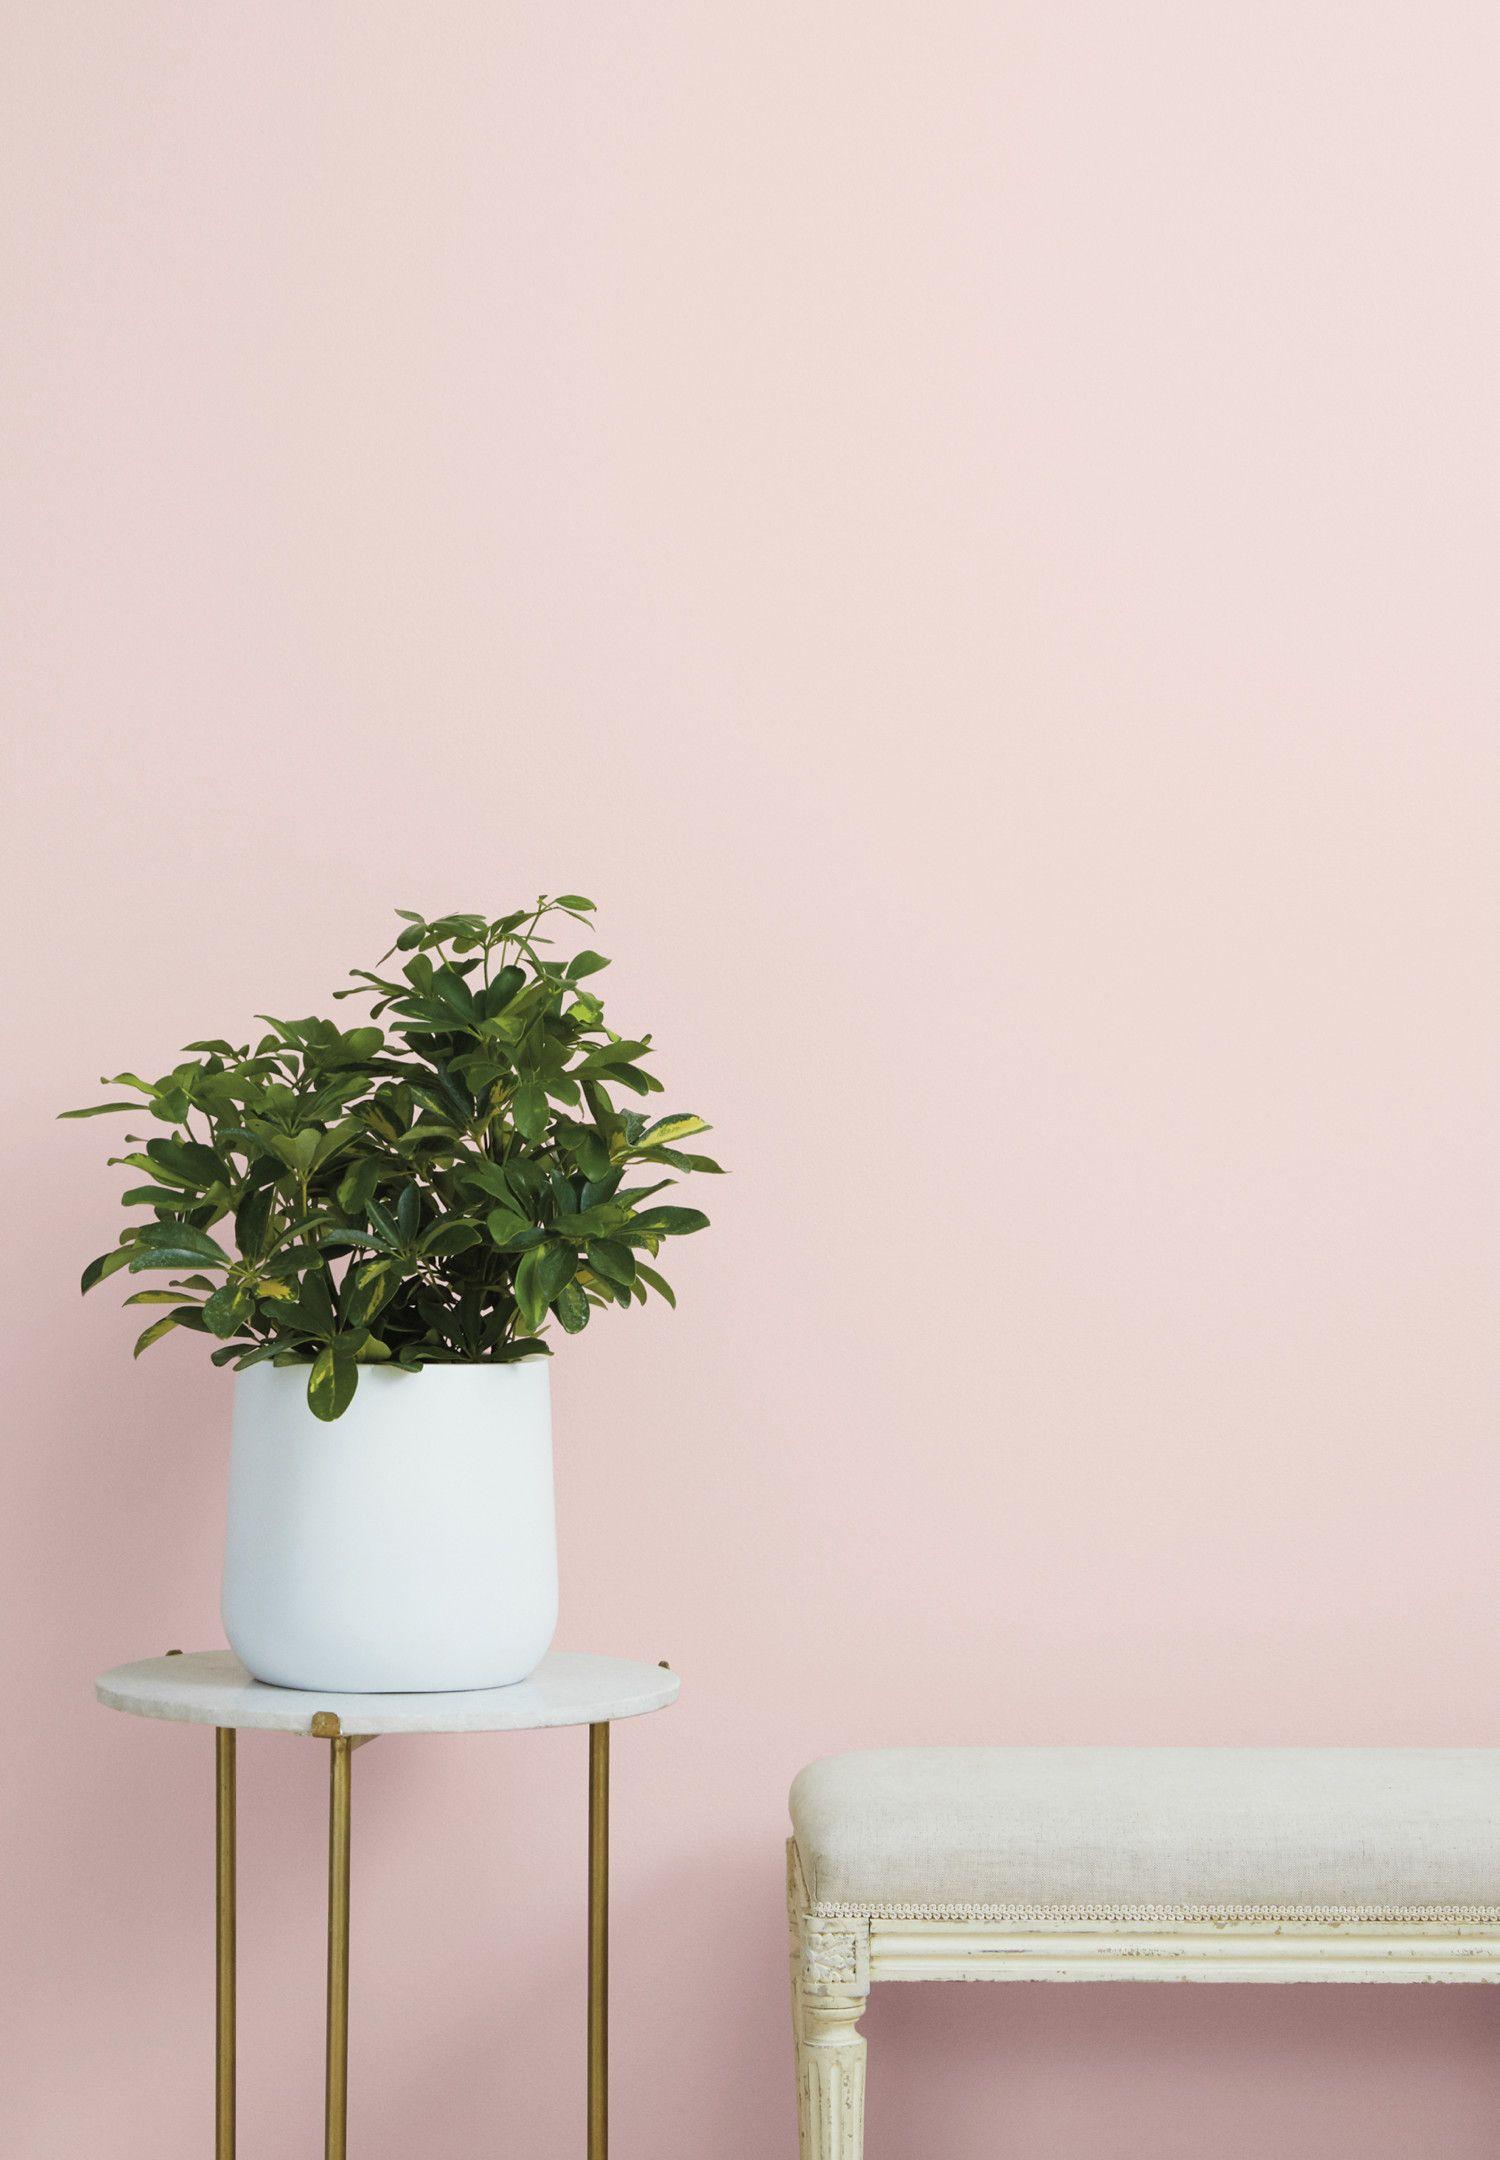 Zodiac Colors Zodiac Signs Colors Clare Pink Paint Colors Light Pink Paint Pink Bedroom Walls